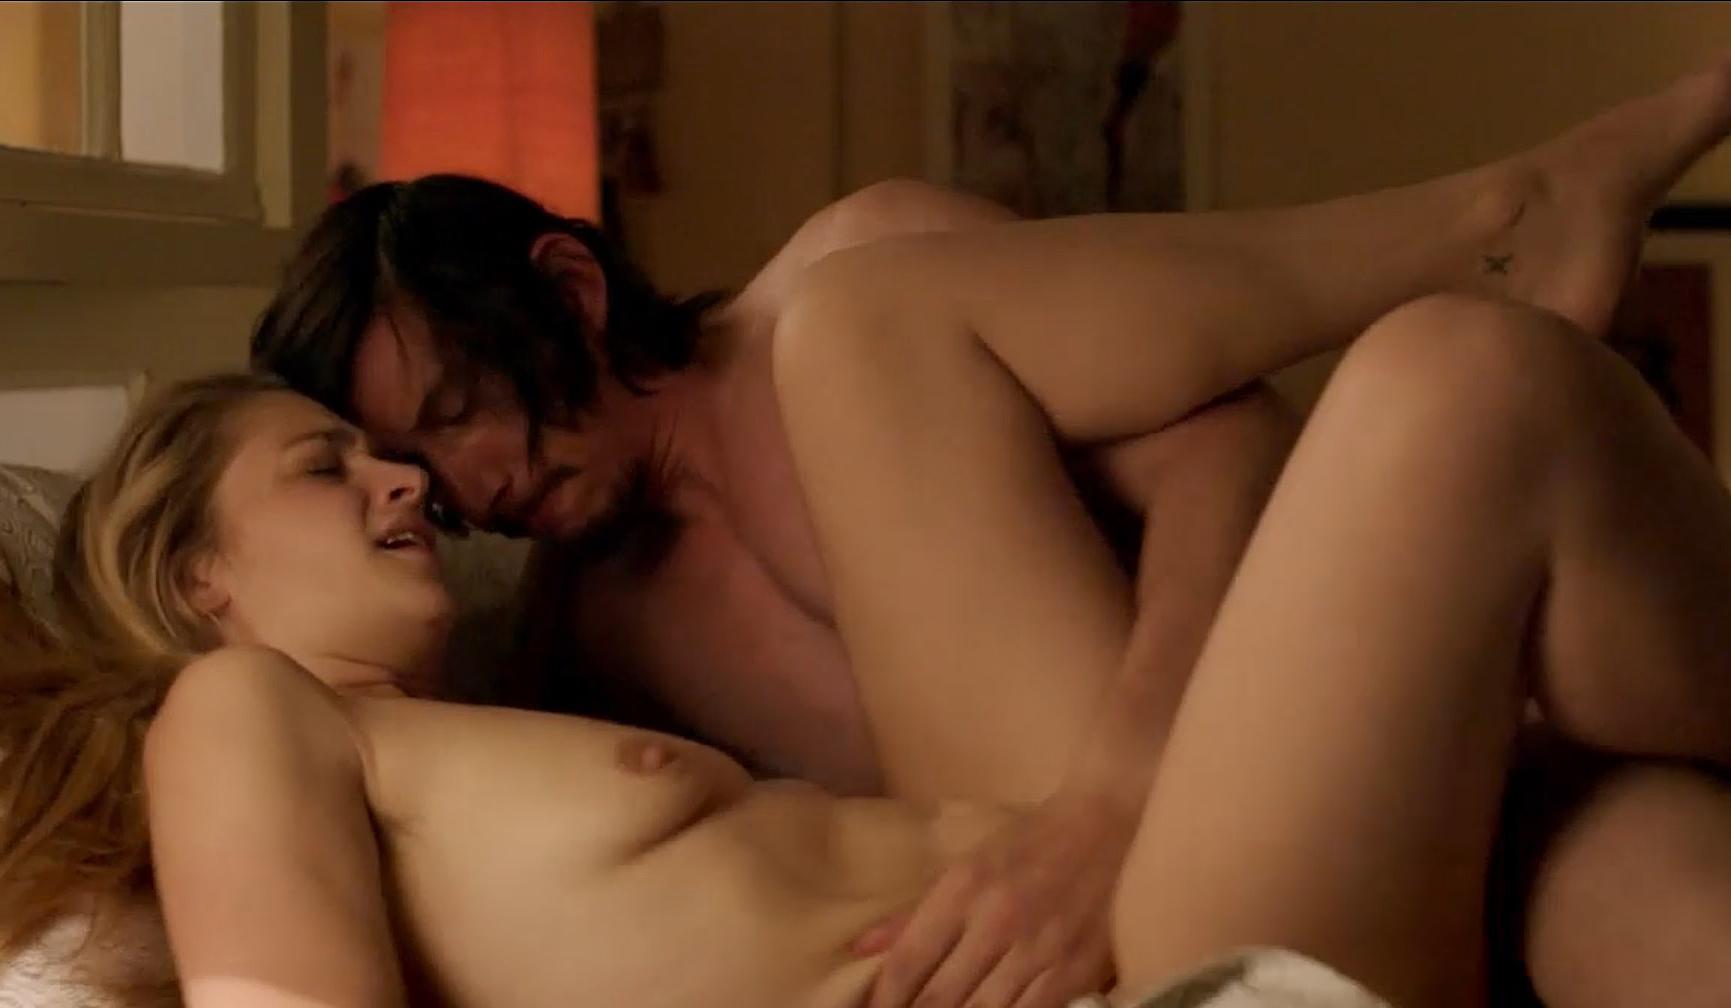 Sex Jemima Kirke nudes (85 foto and video), Topless, Bikini, Boobs, bra 2020